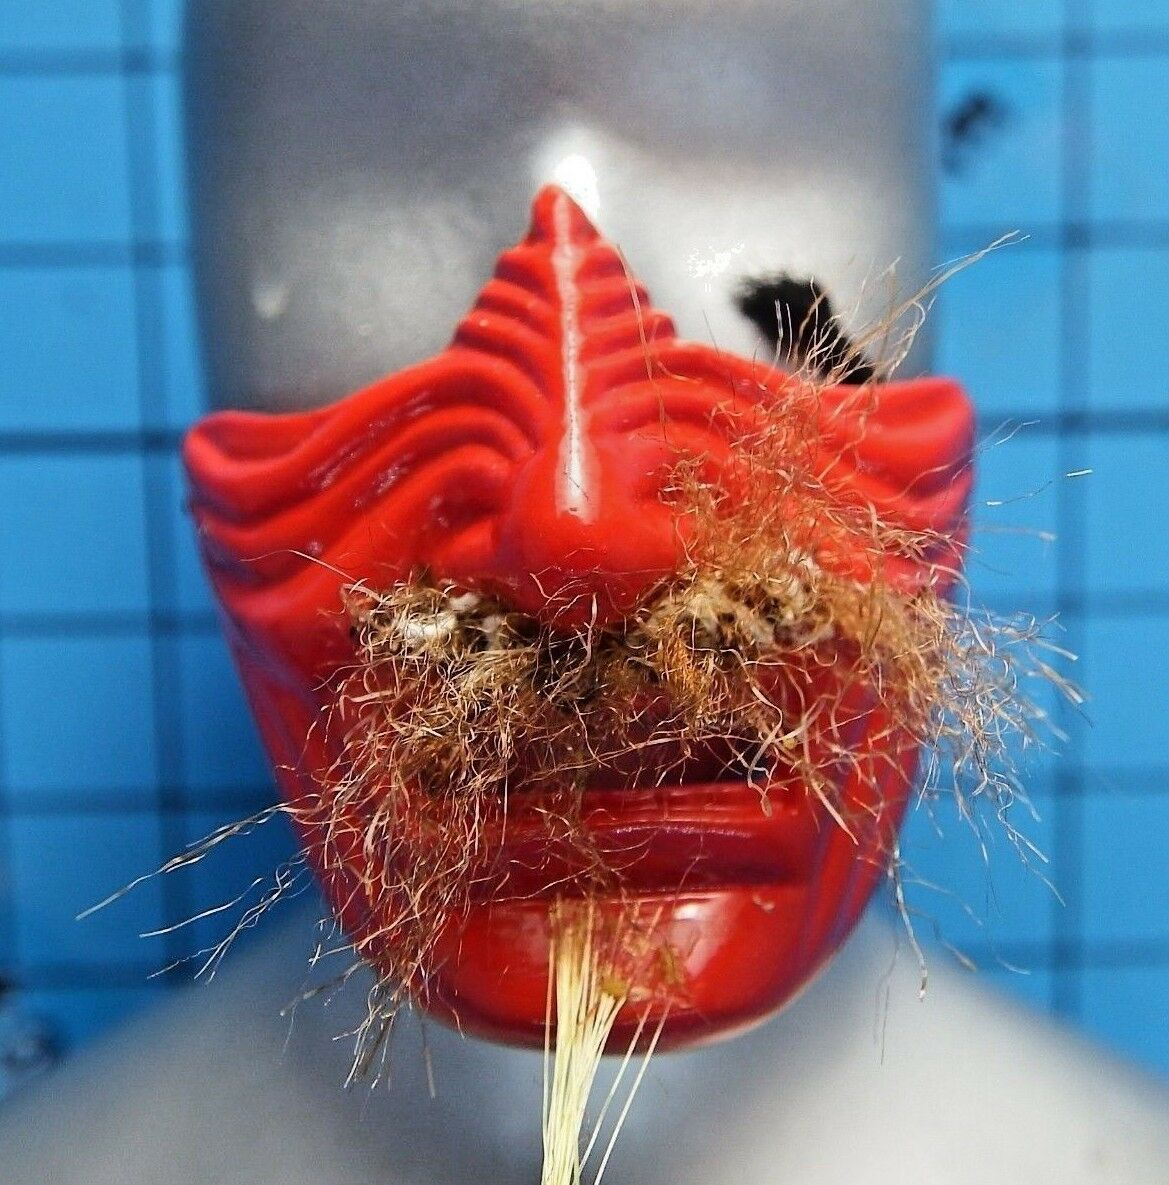 Dem internationalen bis 6 德川家康 ehrwürdiger tokugawa ieyasu samurai - bild - maske